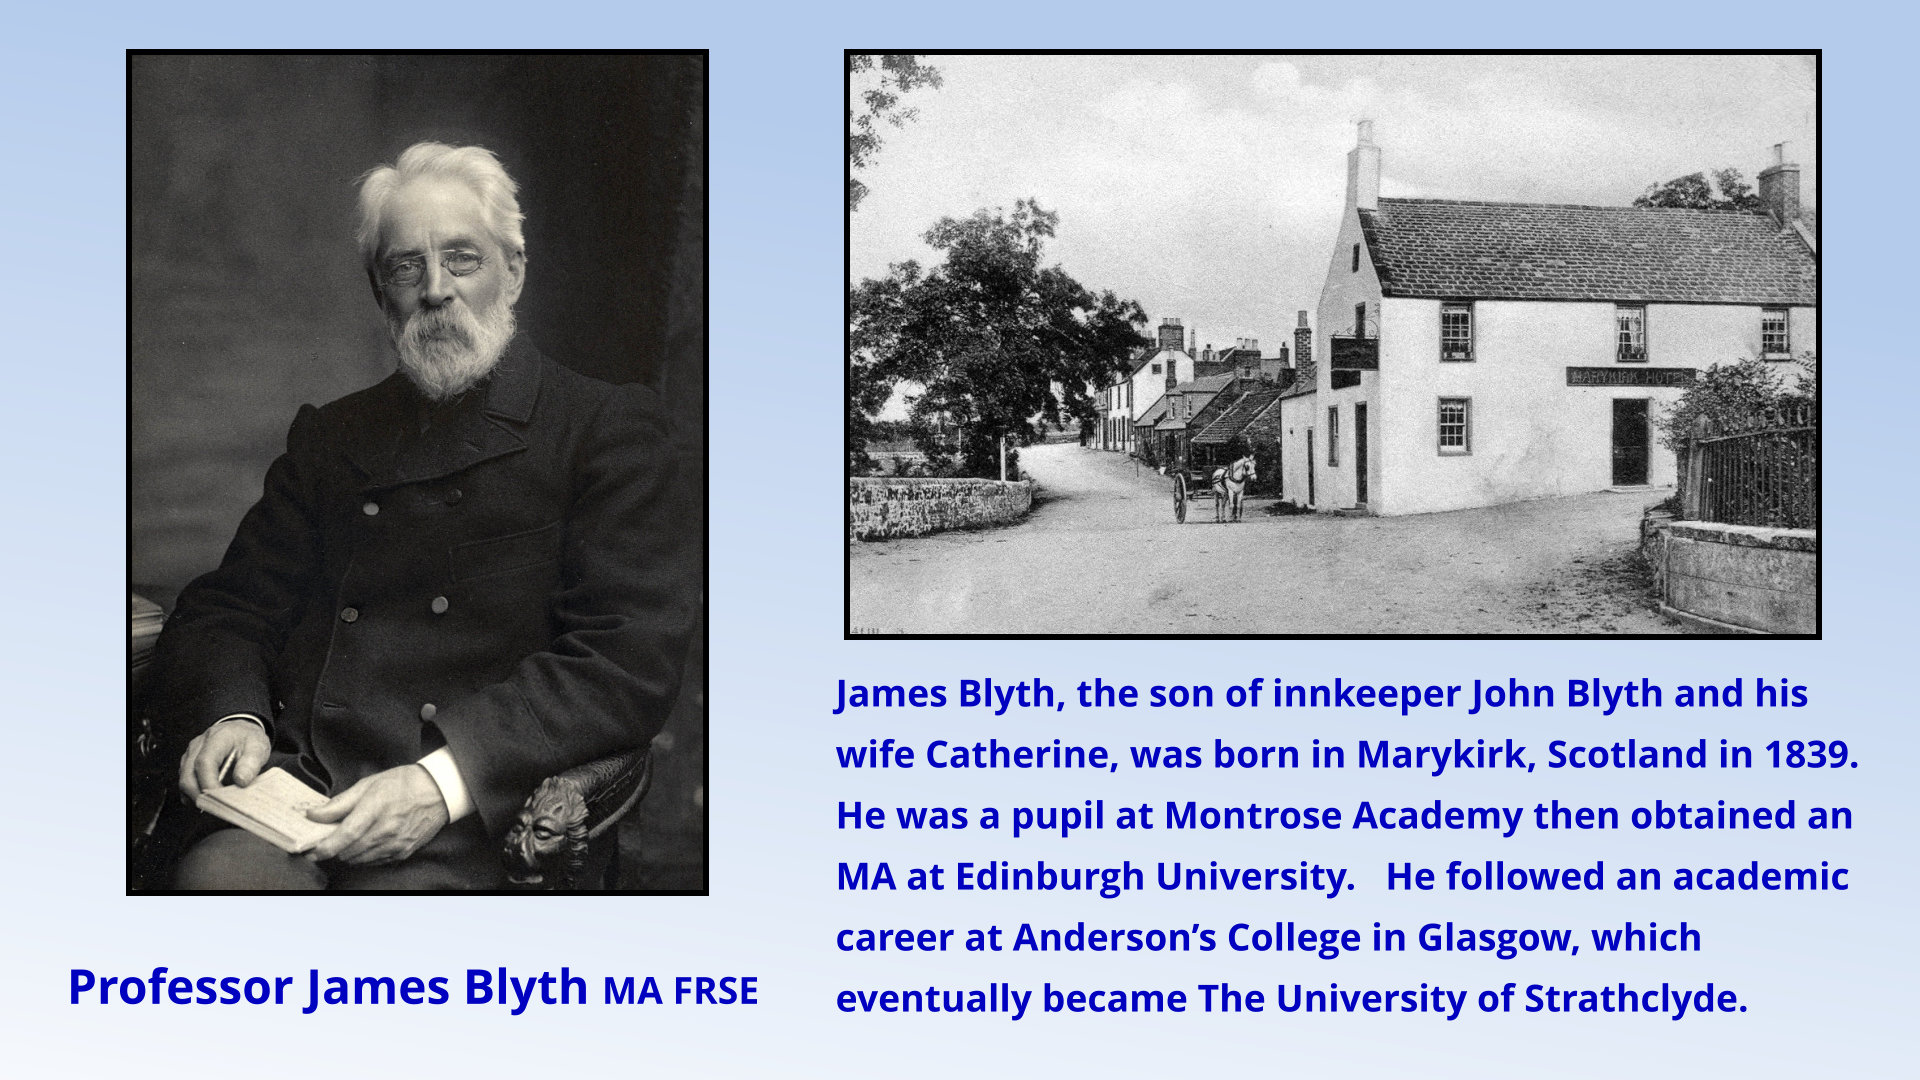 James Blyth image